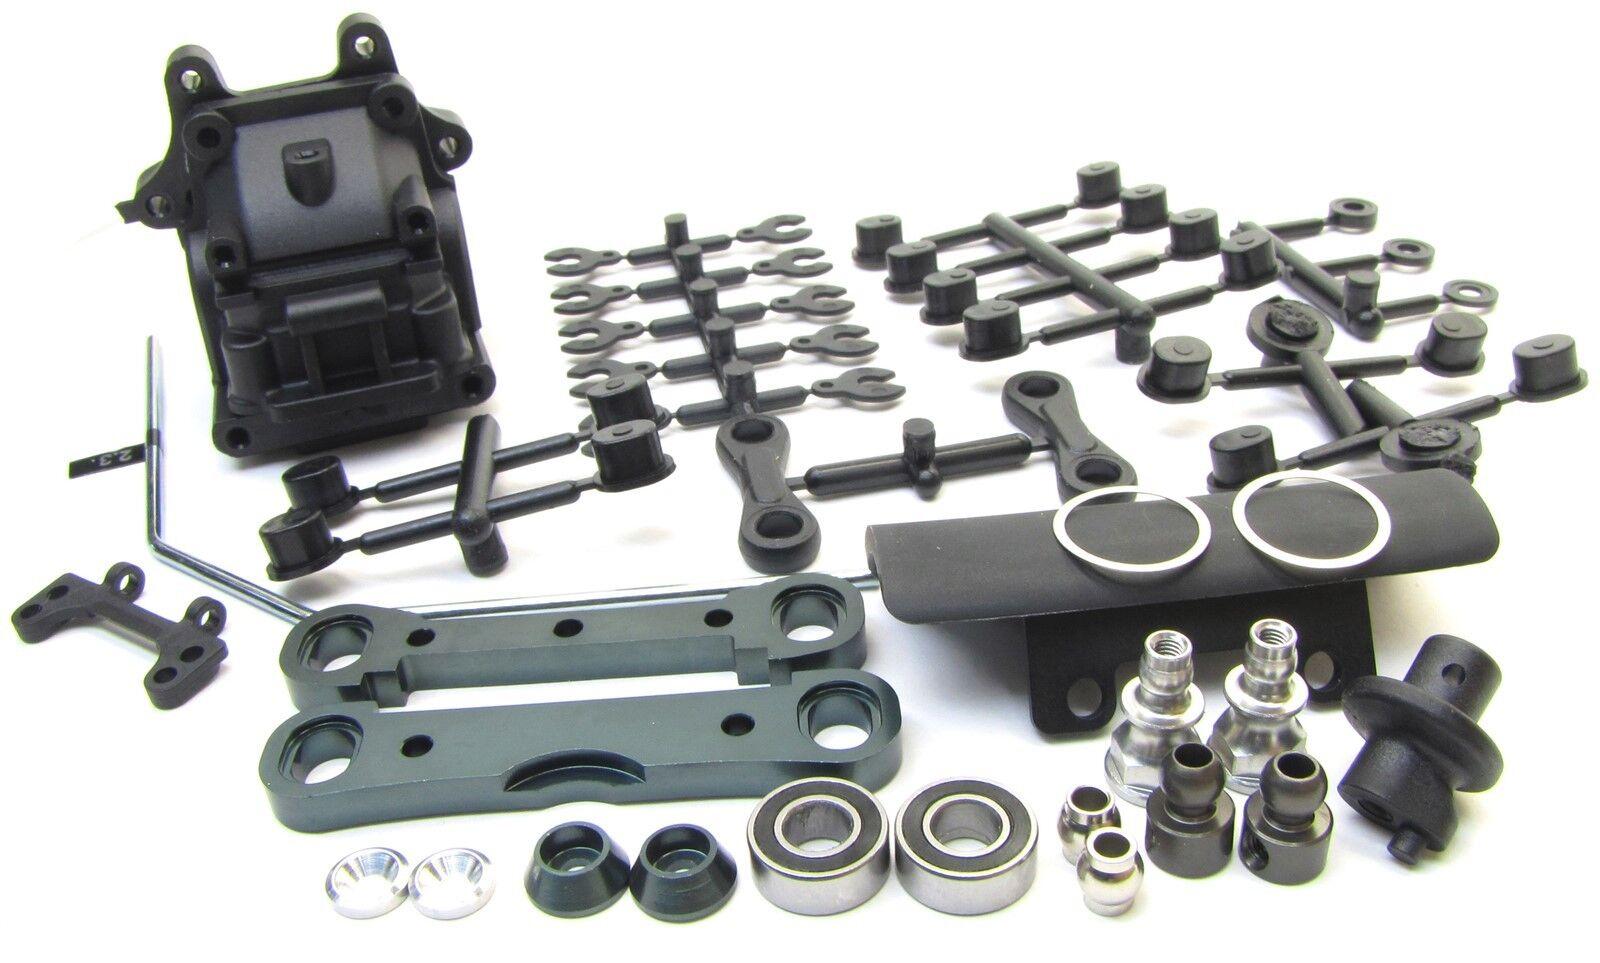 MBX8 FRONT SUSPENSION SET (Sway bulkhead gear box arm mounts bumper MUGEN E2021